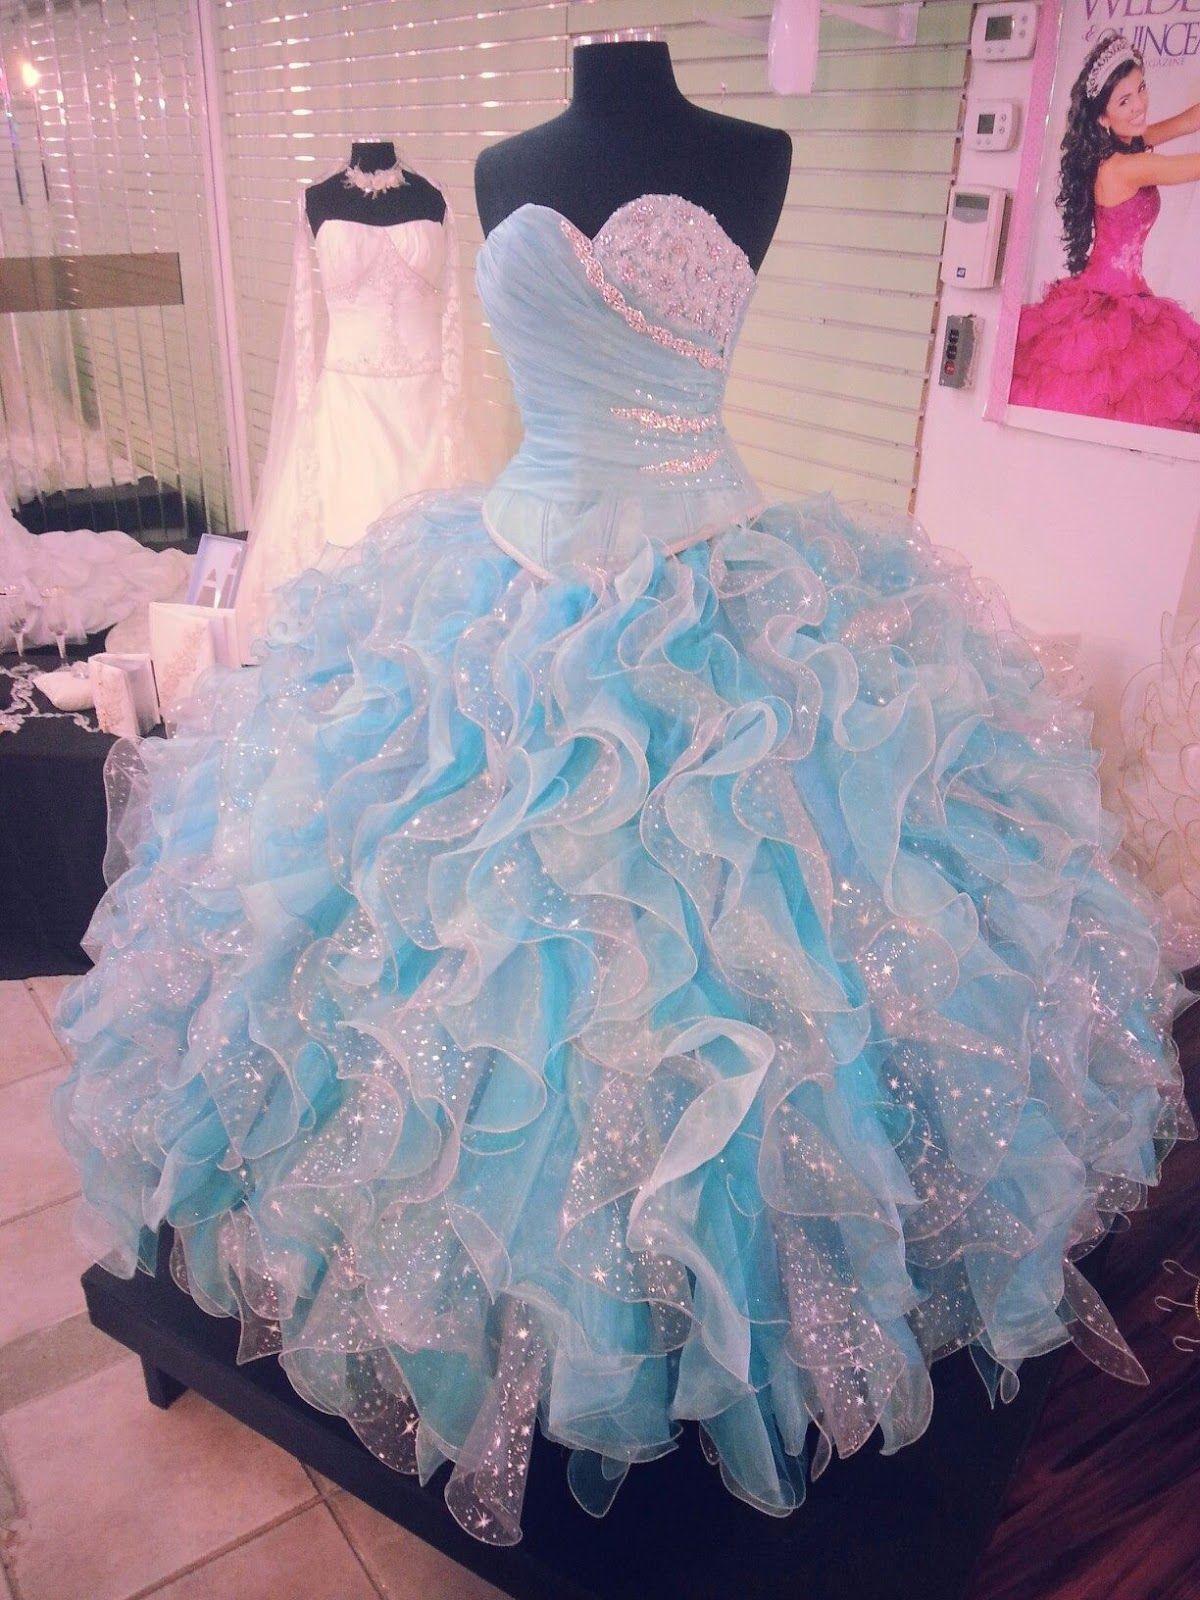 Laglitter Iceprincess3 Jpg 1200 1600 Quinceanera Dresses Blue Sweet 16 Dresses Quince Dresses [ 1600 x 1200 Pixel ]